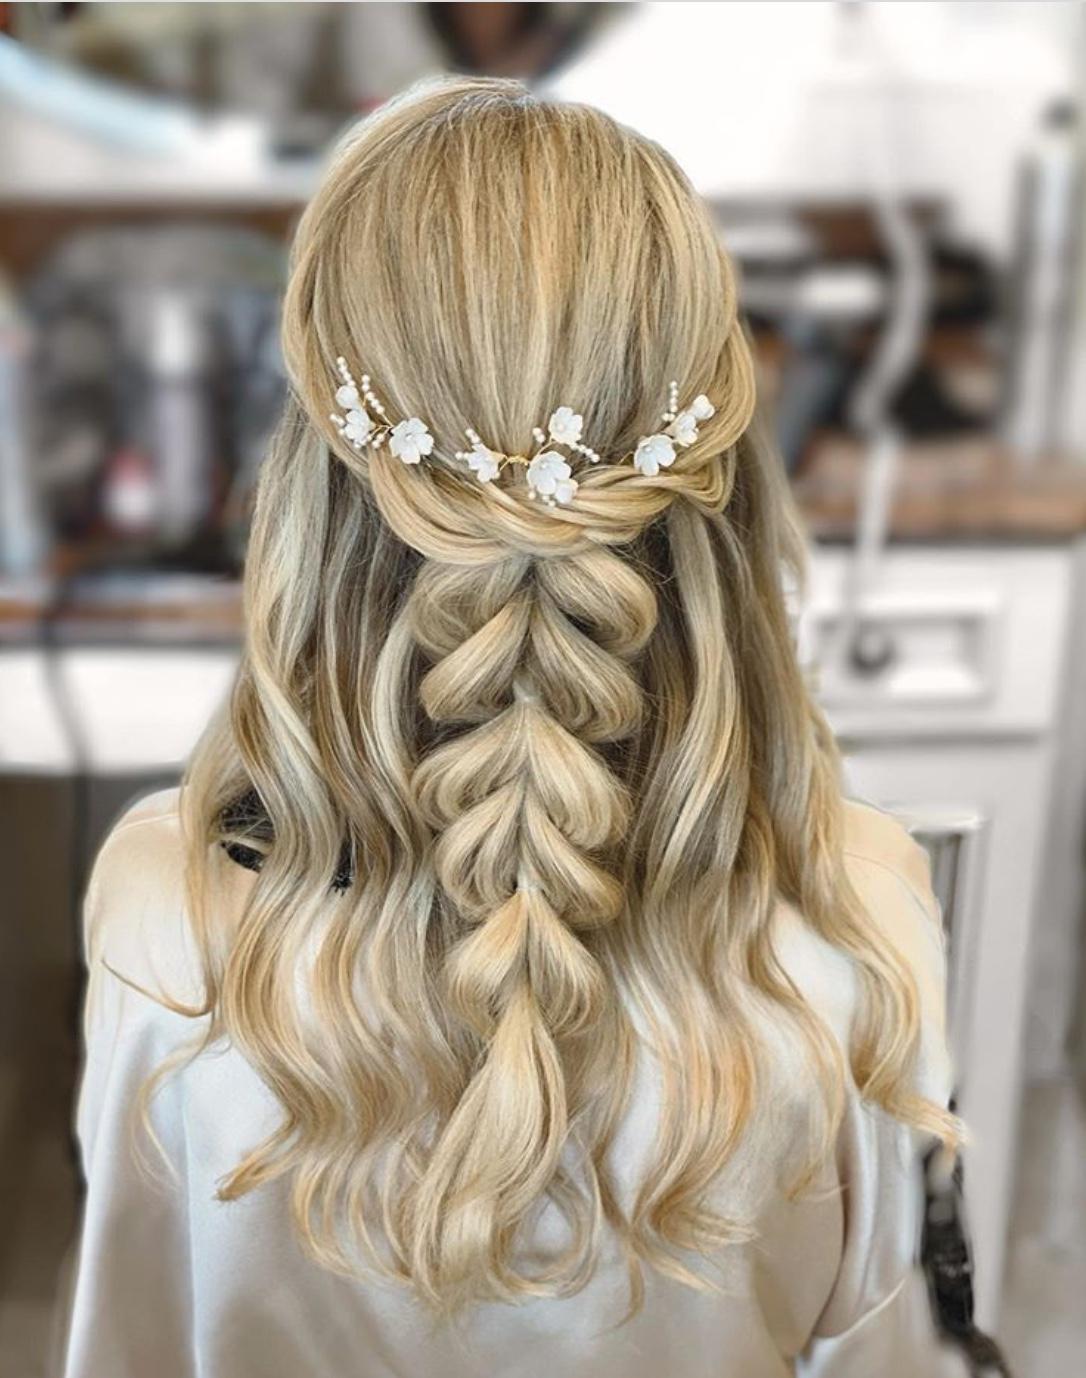 Boho bridal hairstyles